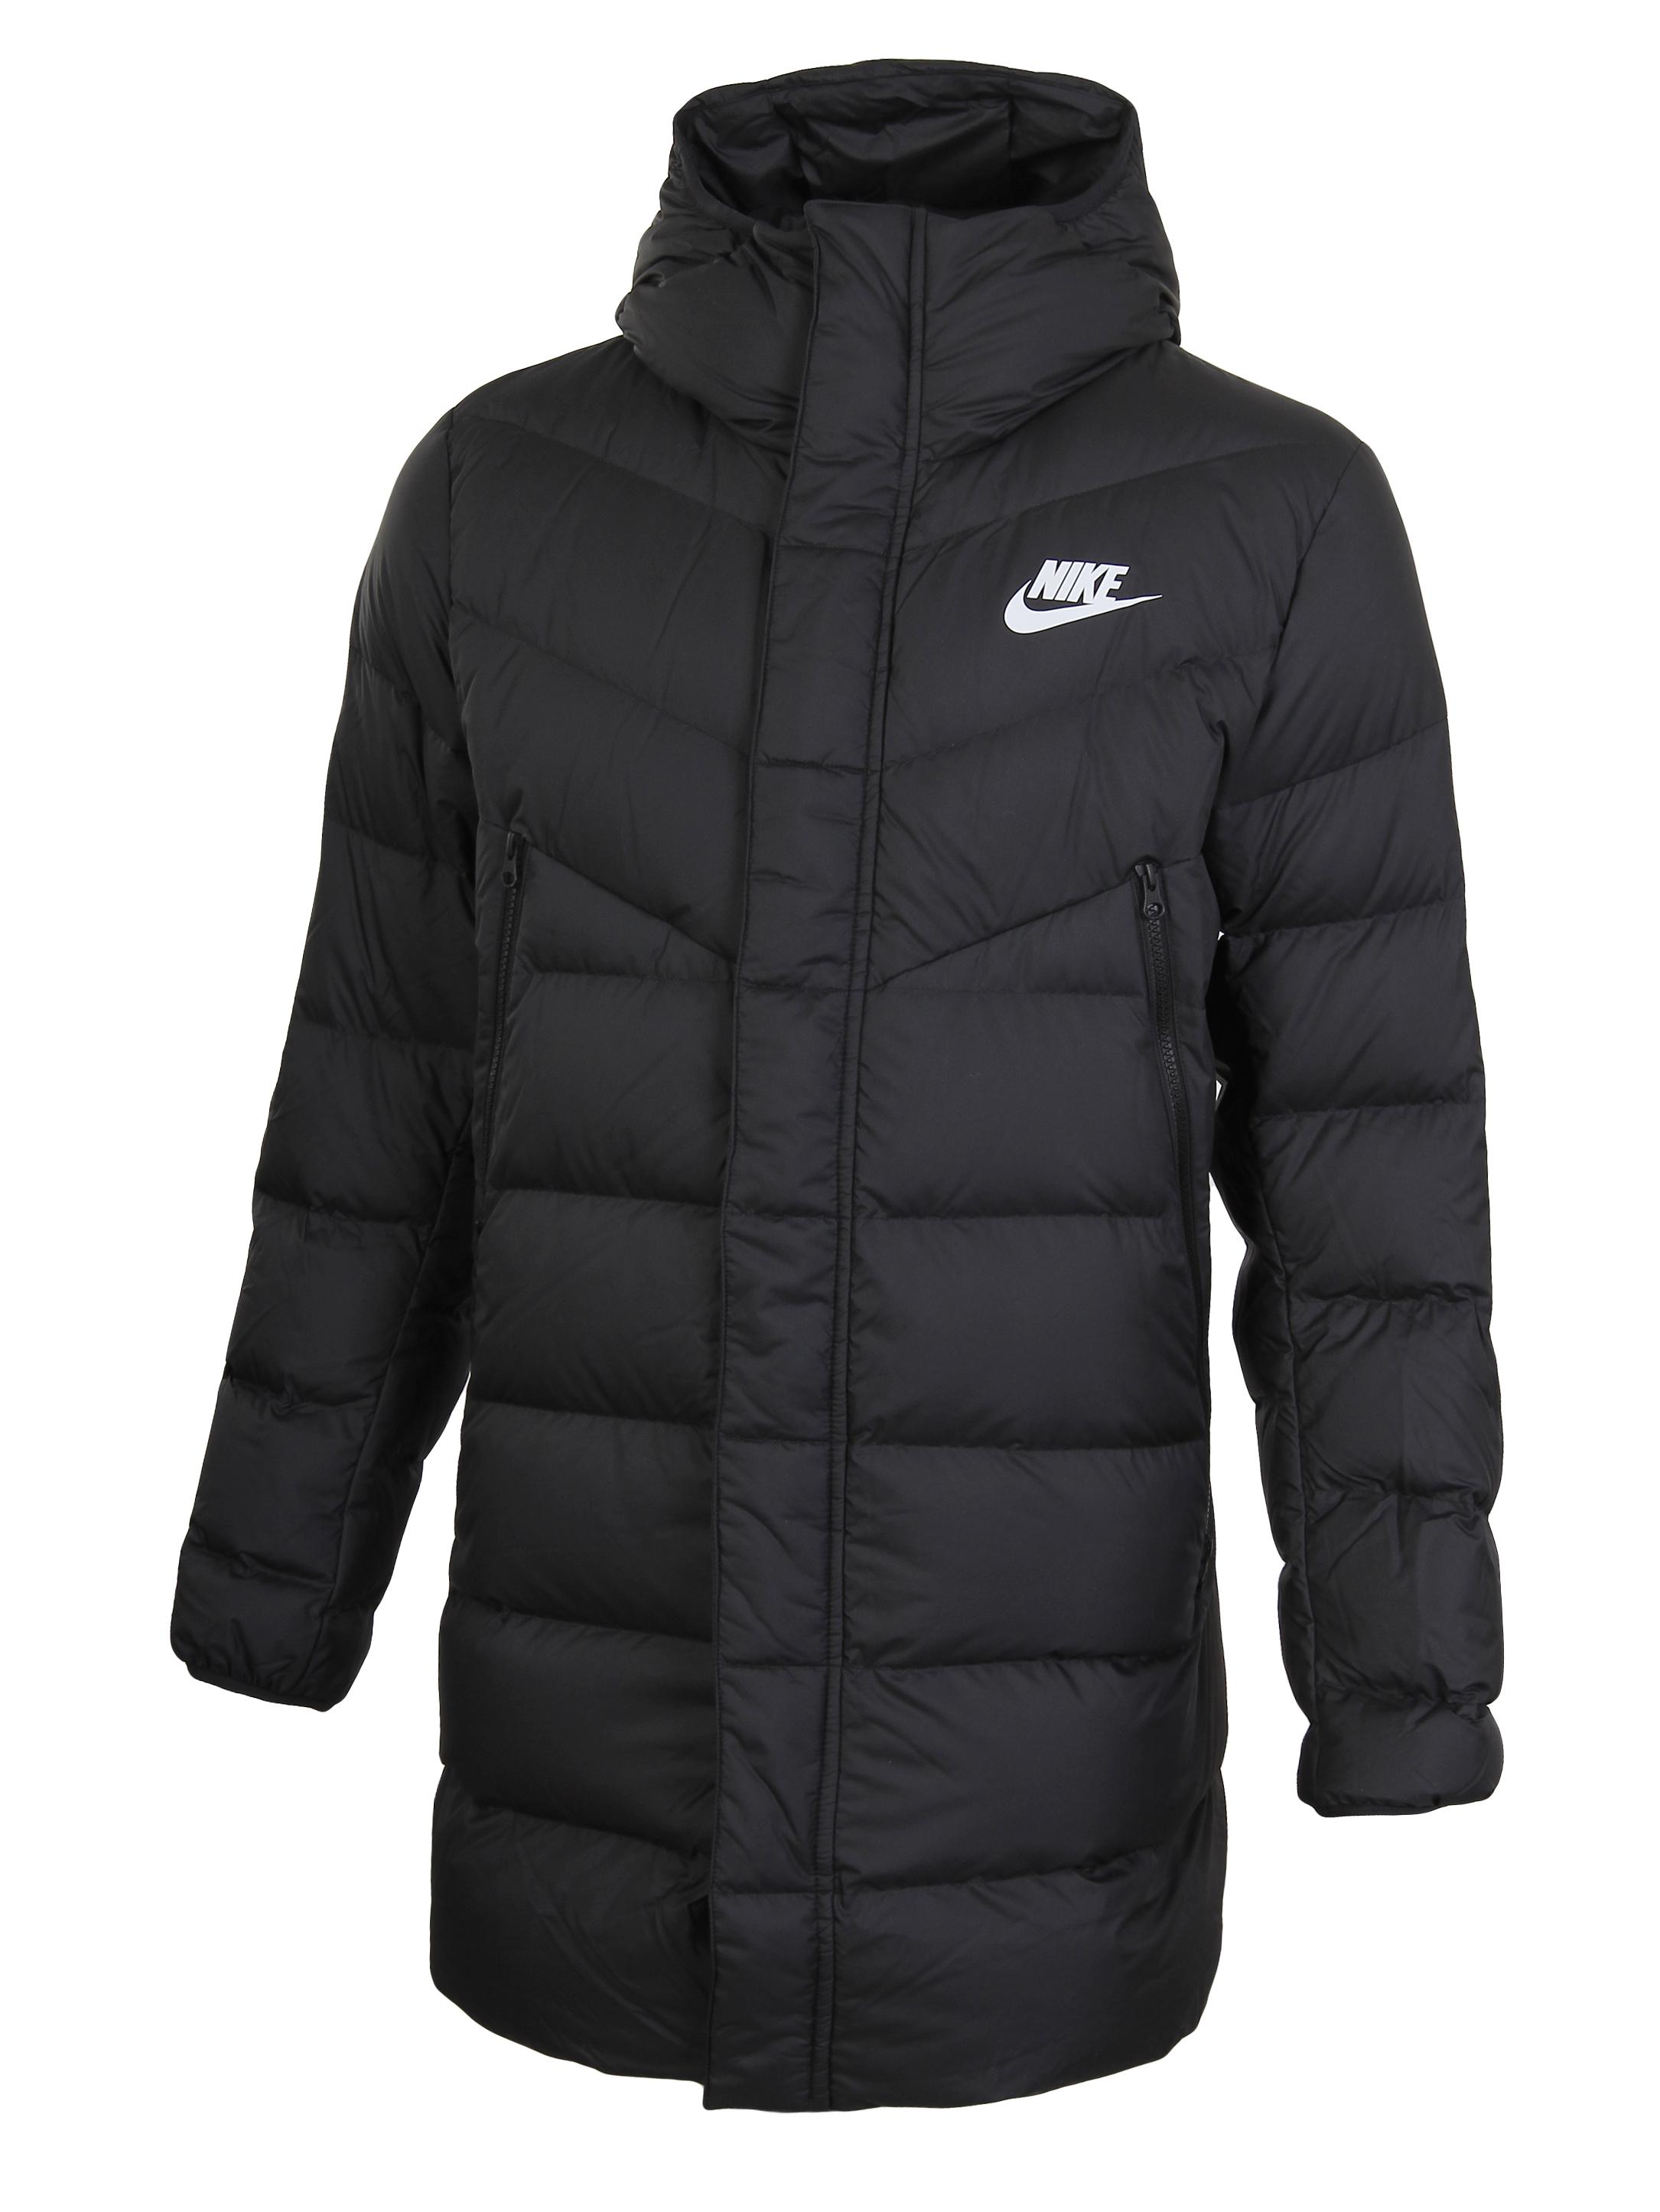 9d02c605 Пуховик мужской Nike Sportswear Windrunner - Сеть спортивных ...